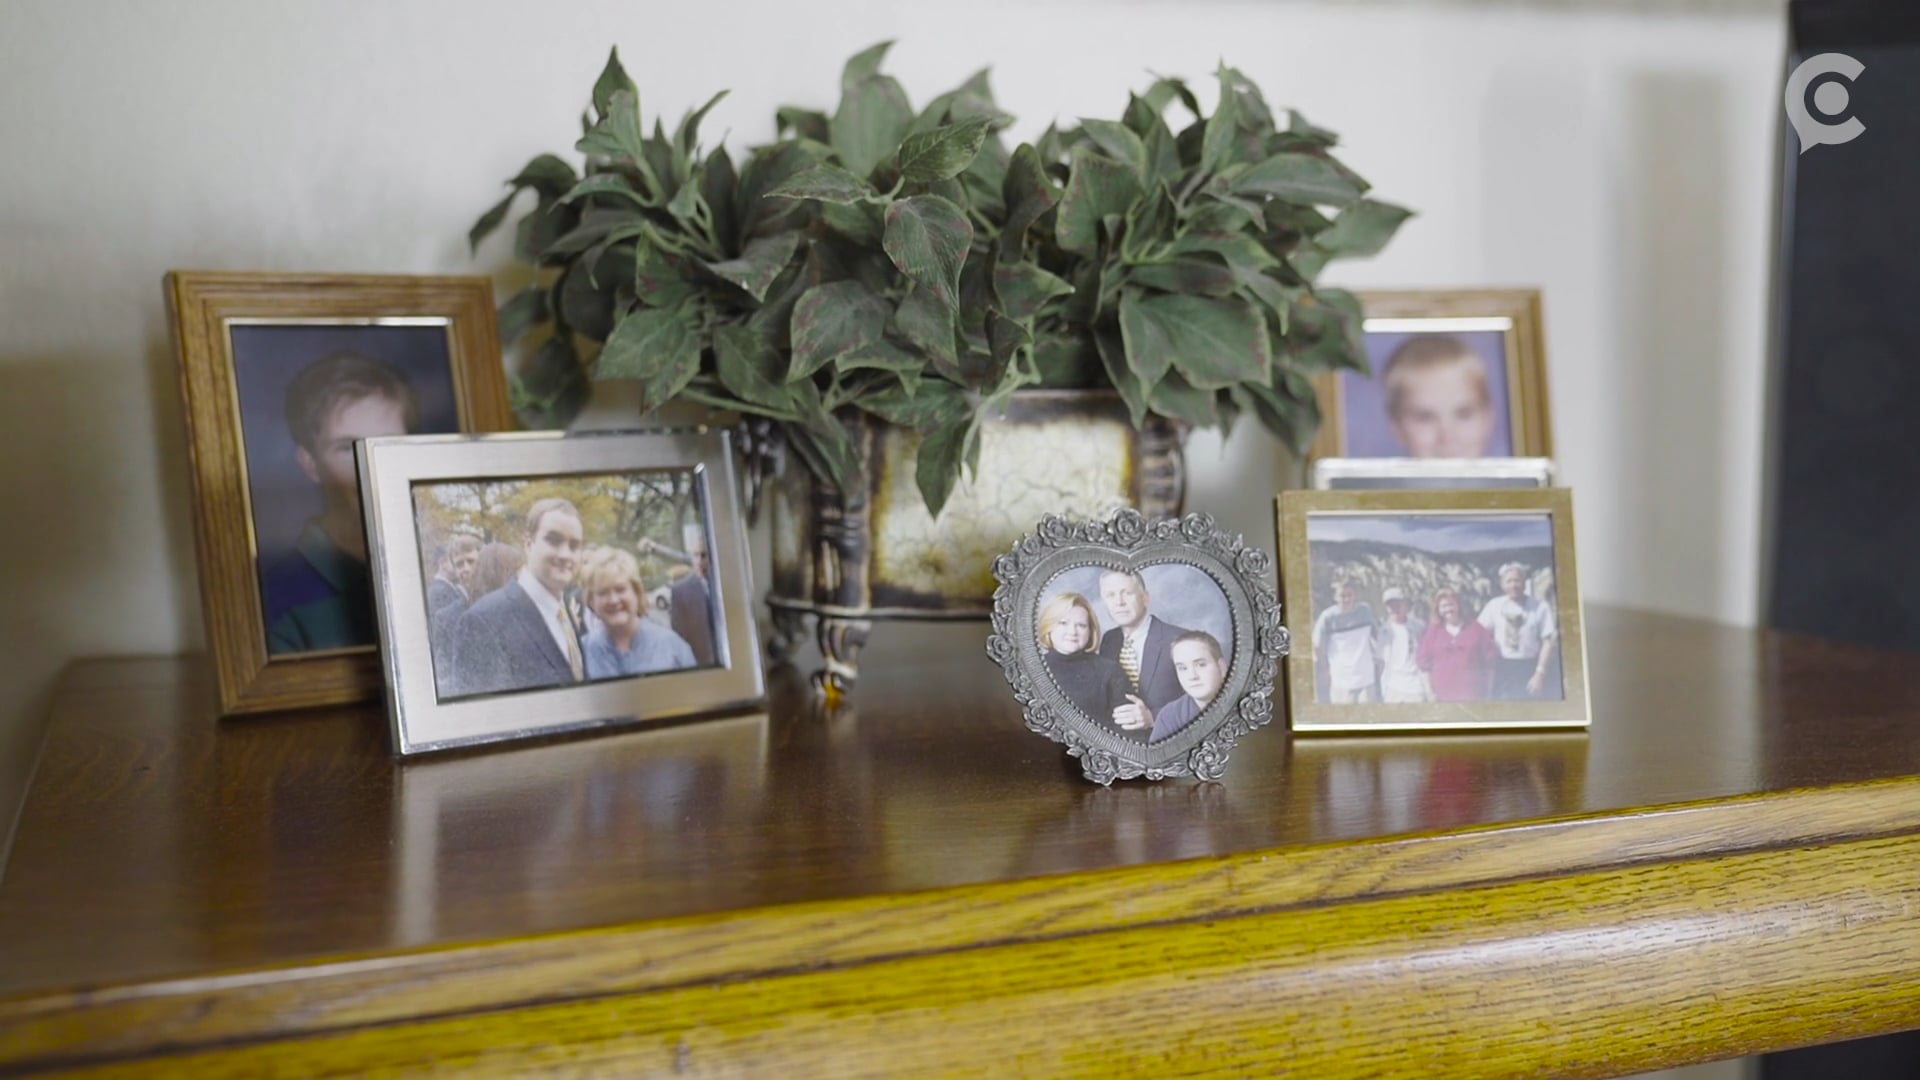 Hate in America: 20 years after Matthew Shepard's murder